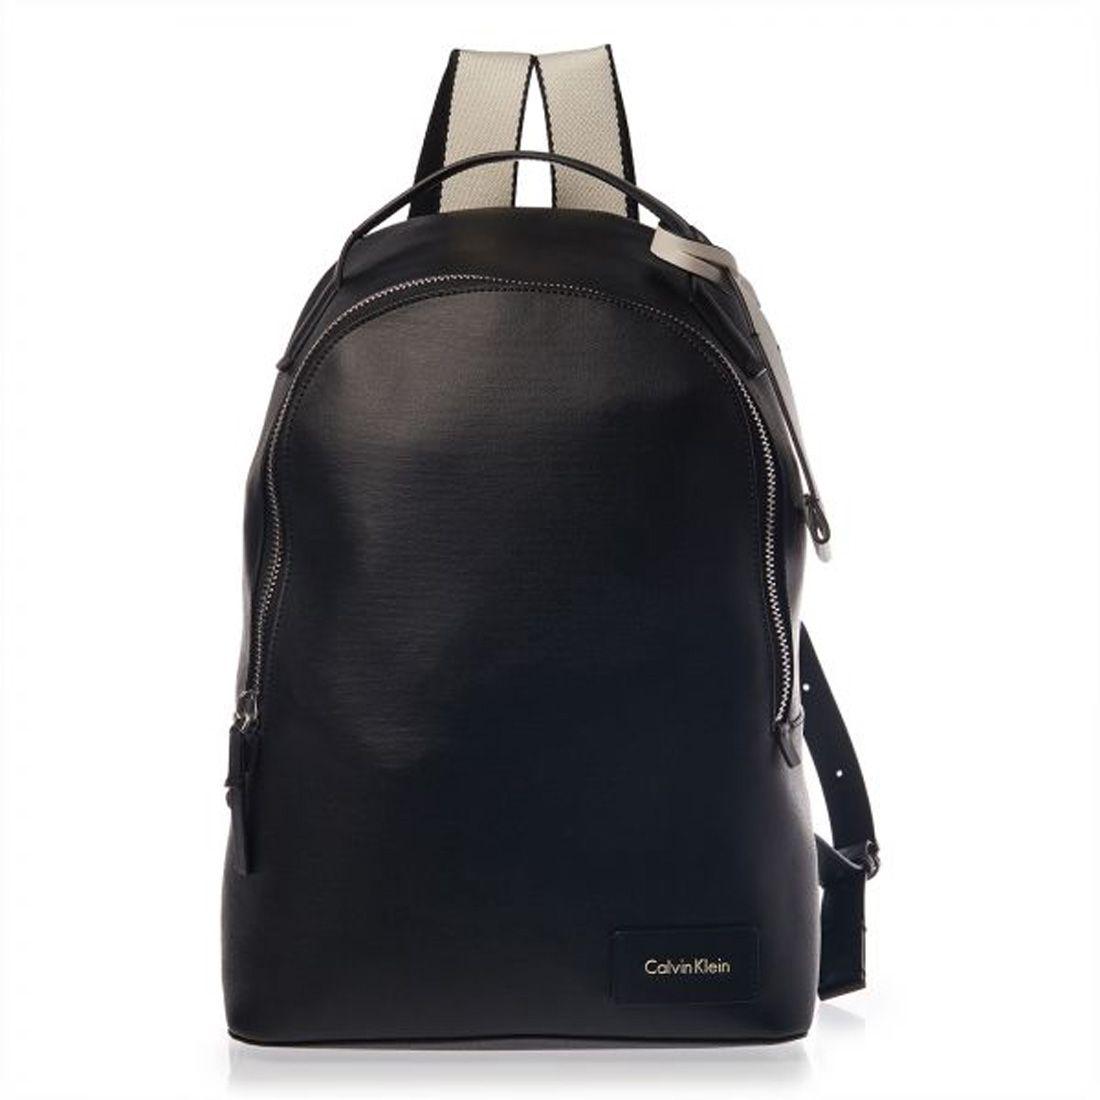 f7709a250 Mochila Calvin Klein Urban Backpack Preta - JP Import - Produtos ...